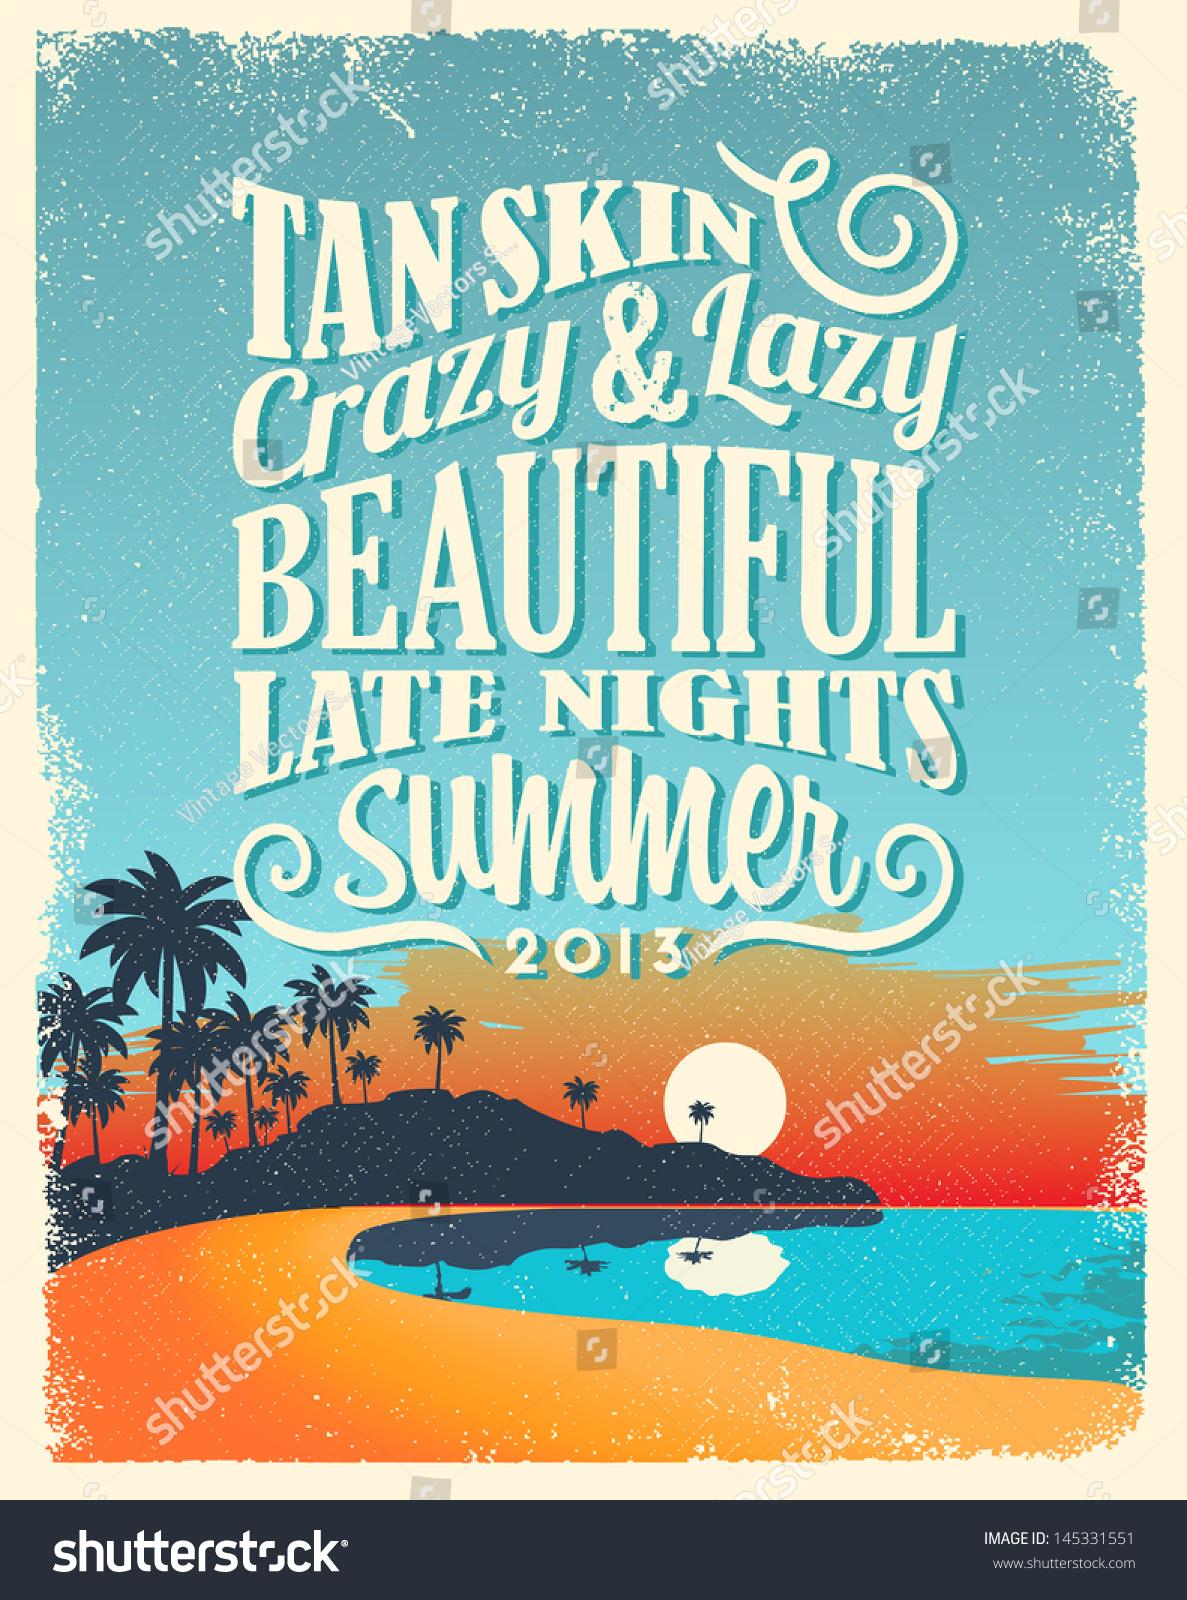 Poster design vintage - Retro Vintage Summer Poster Design With Typography